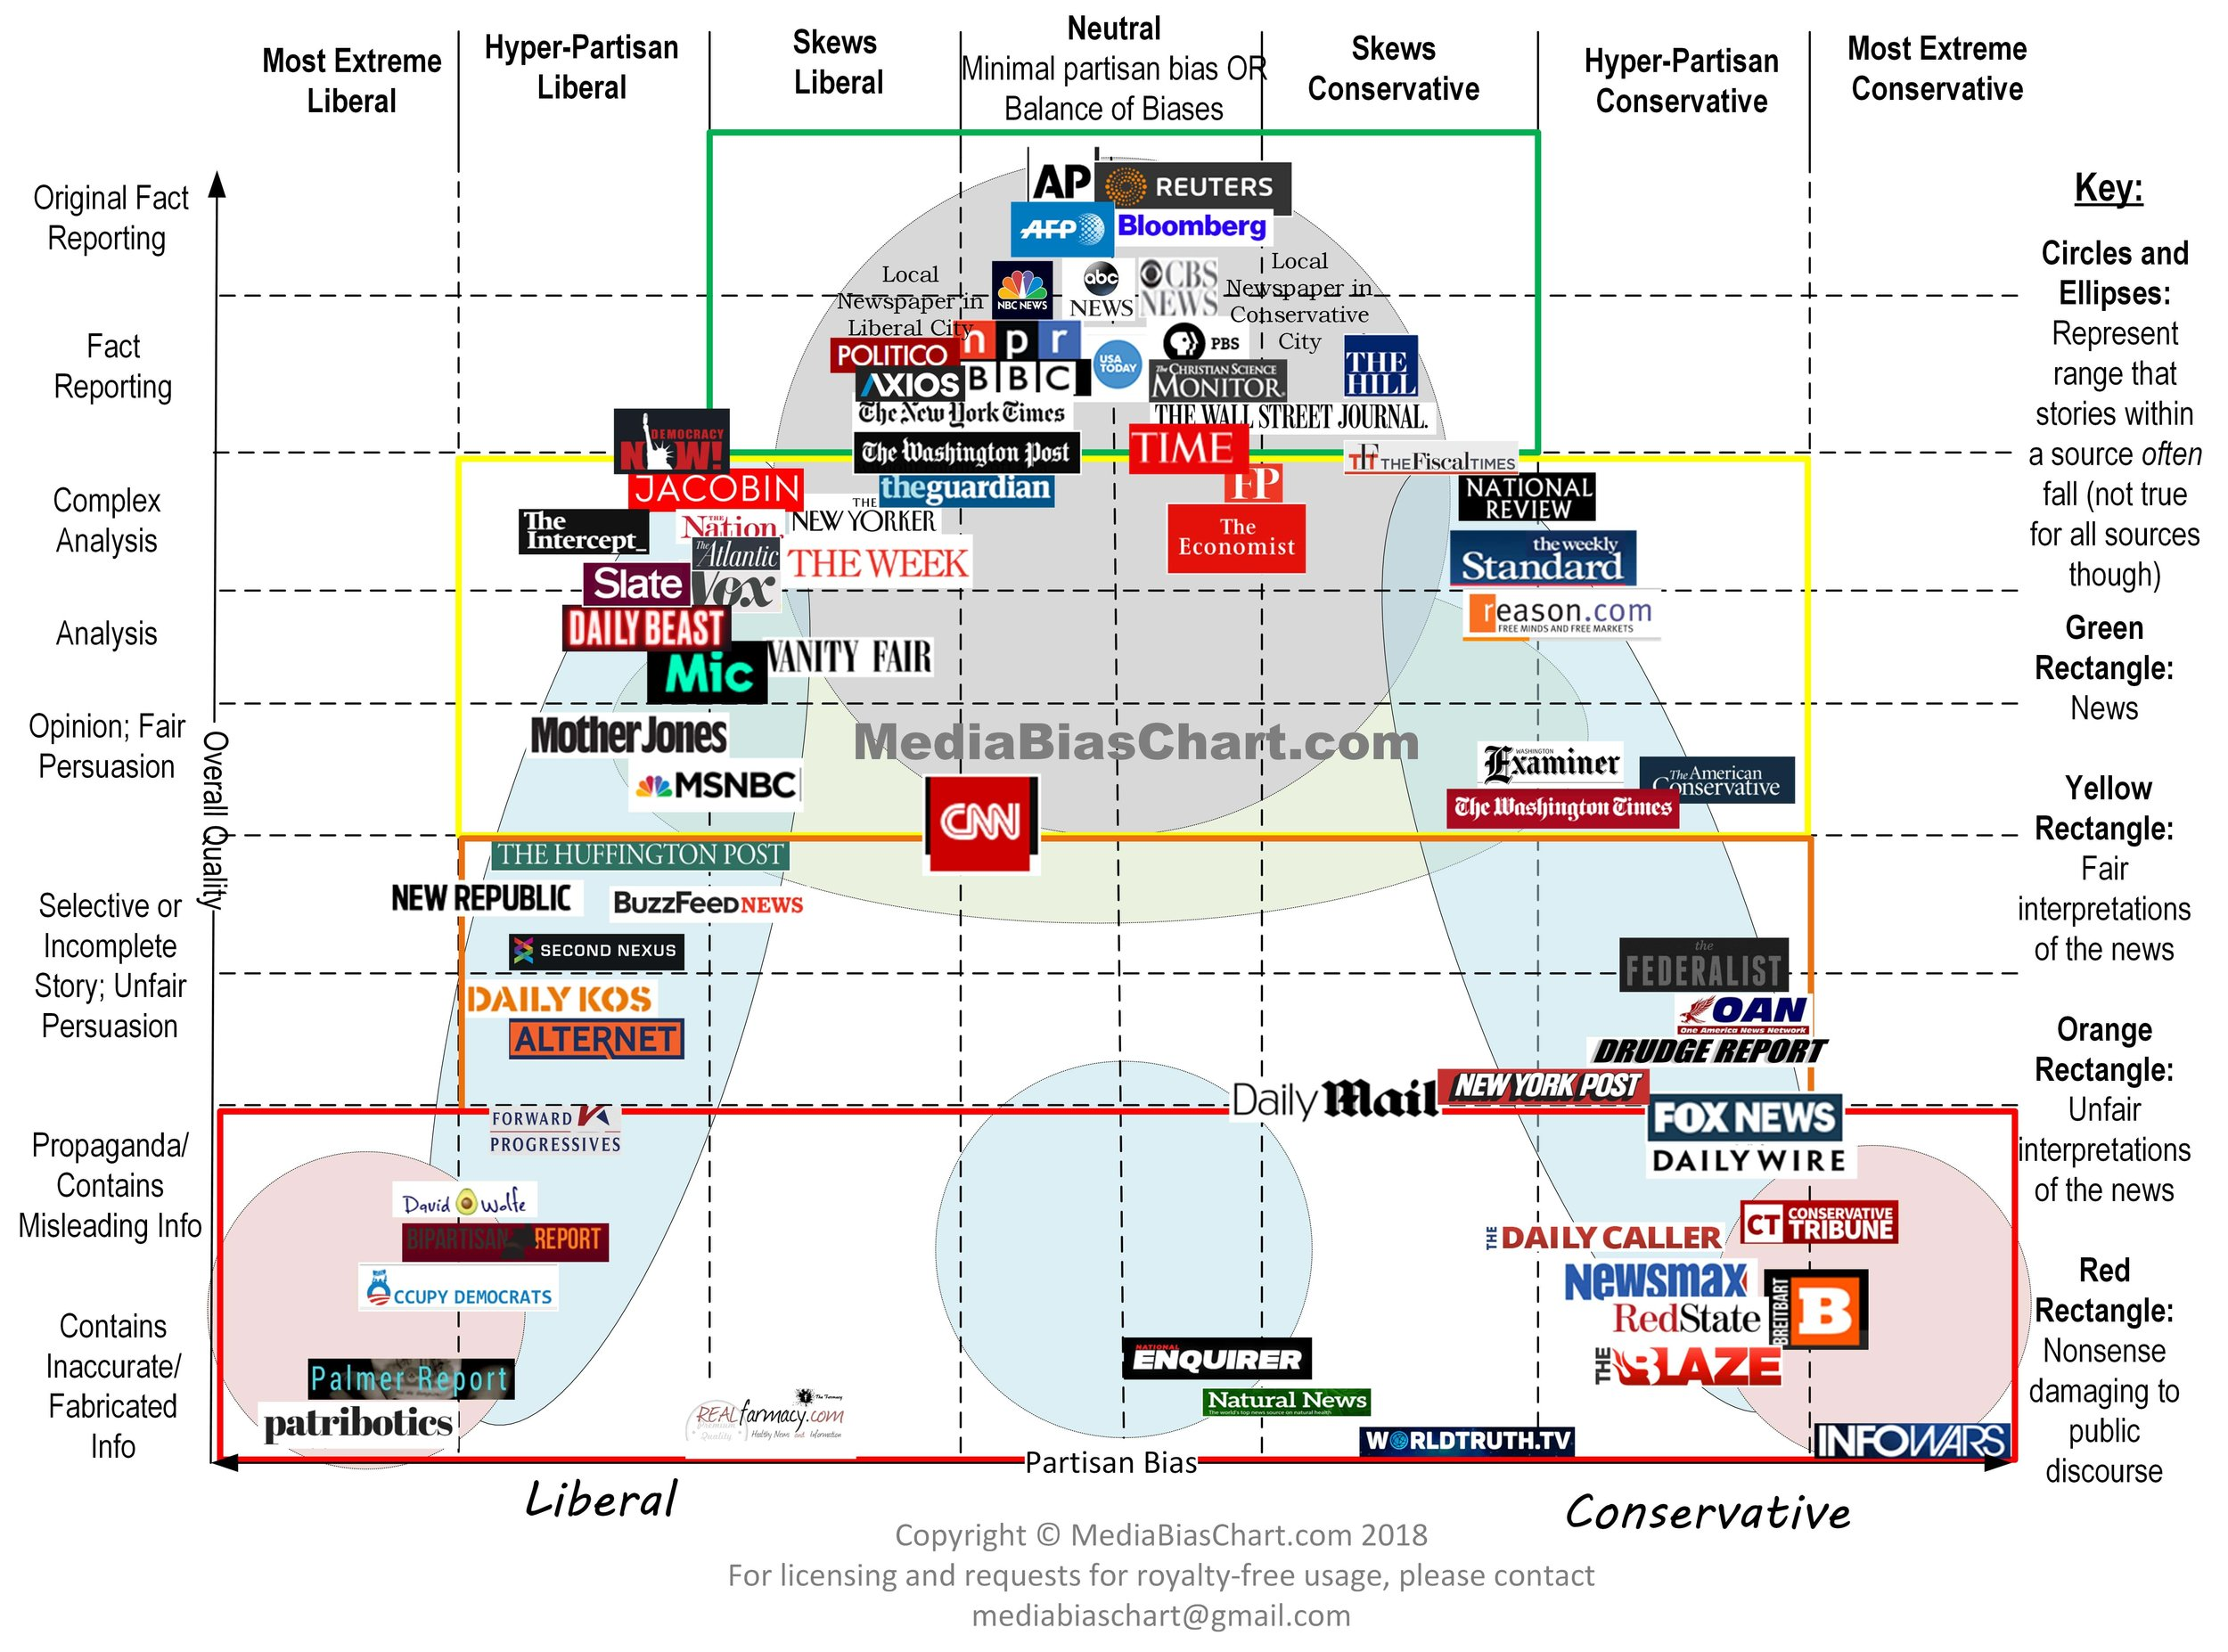 Trustworthy Sources Diagram  Credits